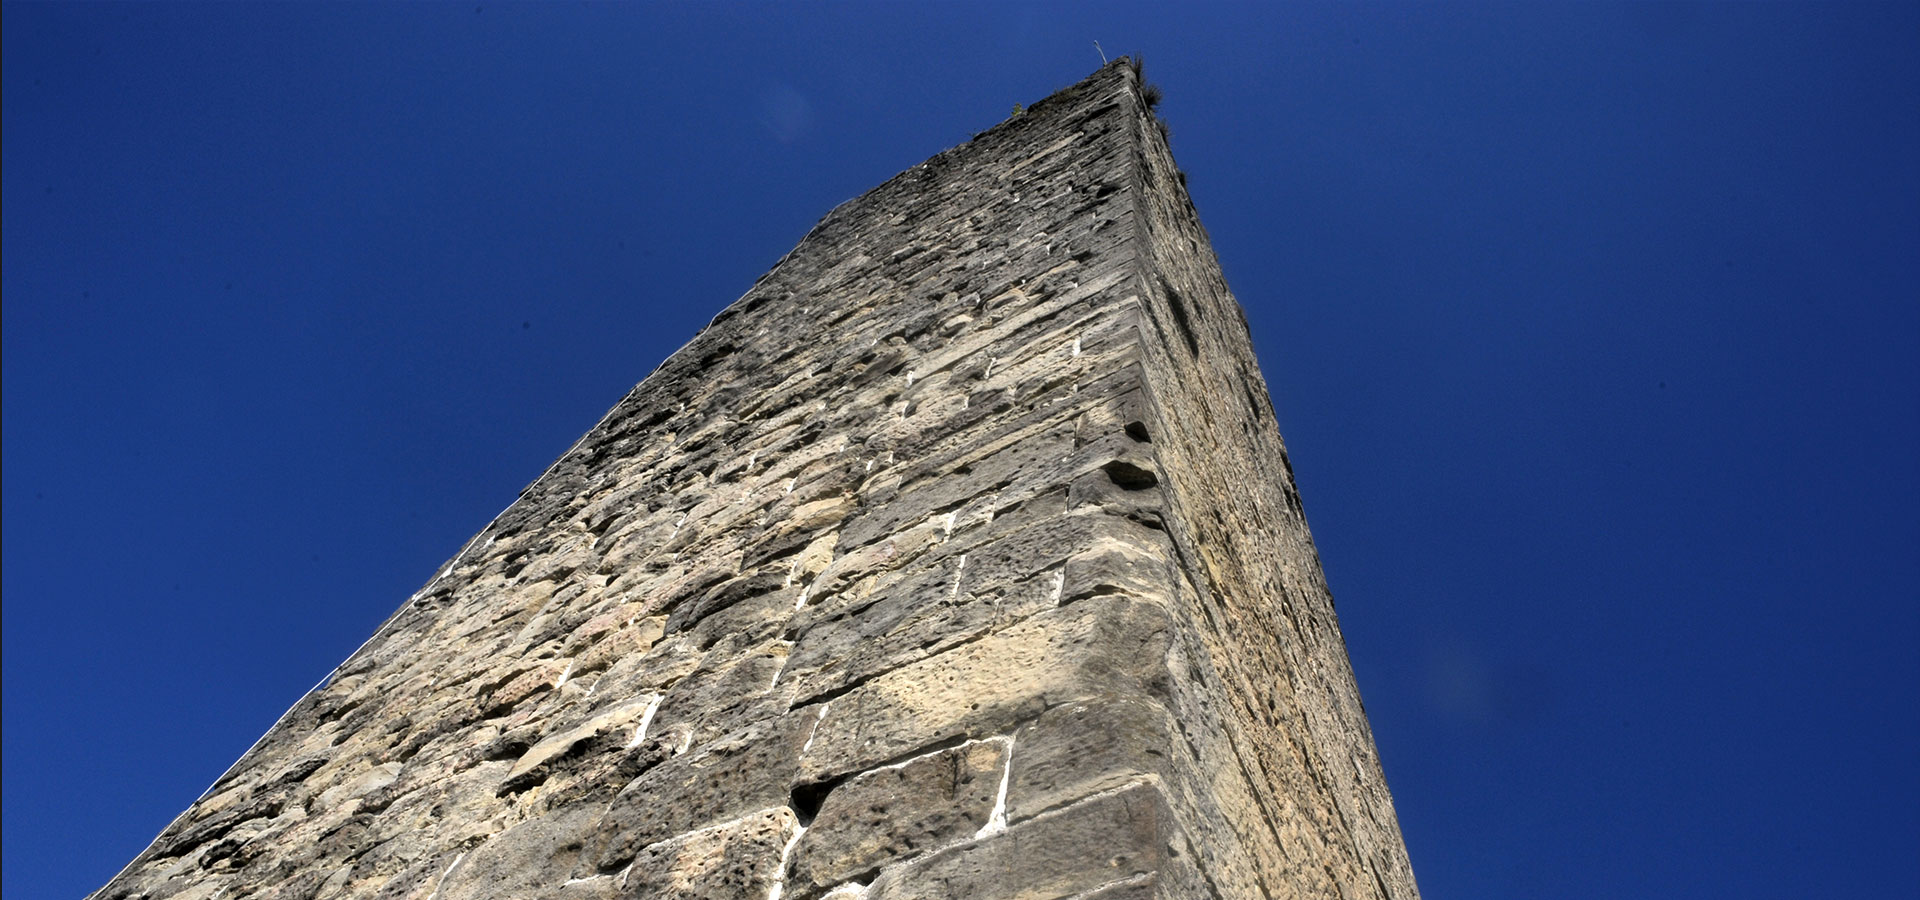 torre-castelnuovo-di-ceva-1